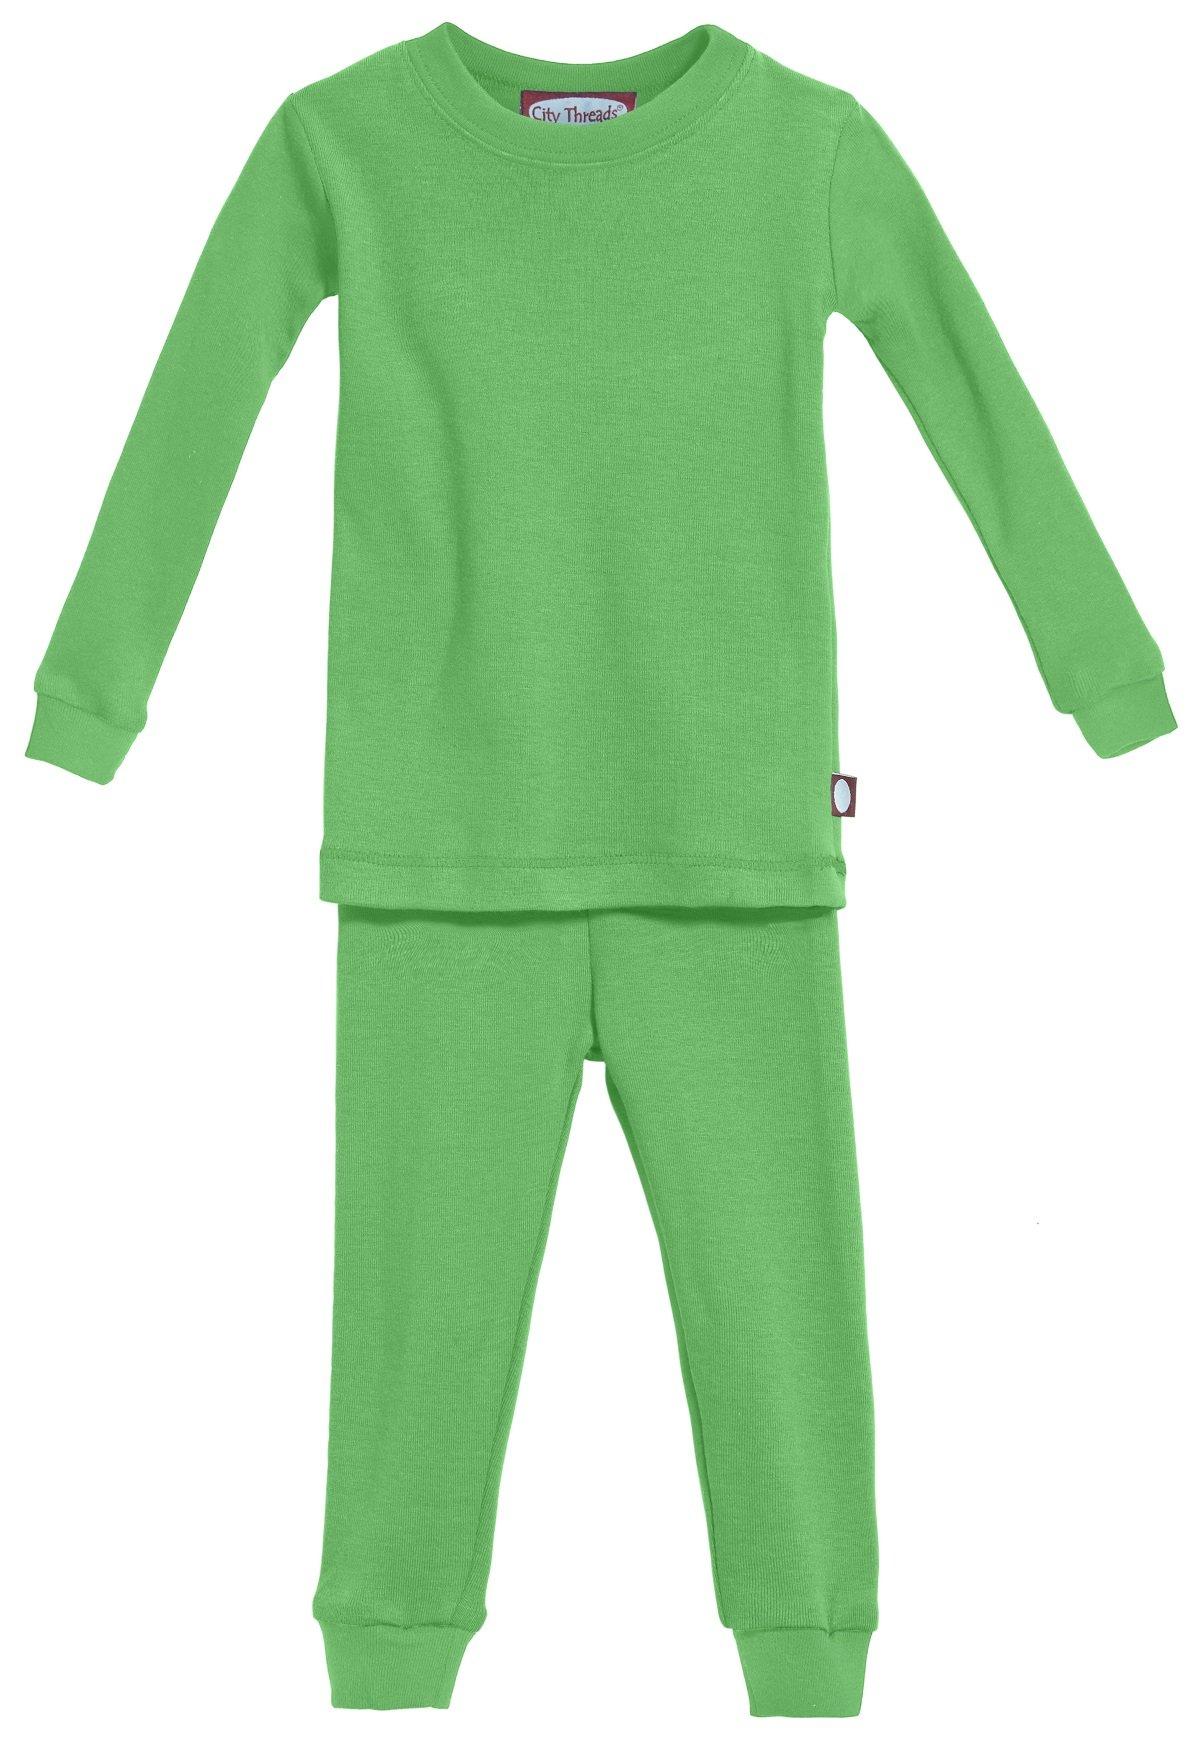 City Threads Boys' and Girls' Pajama Set PJs, Organic Cotton, Made in USA